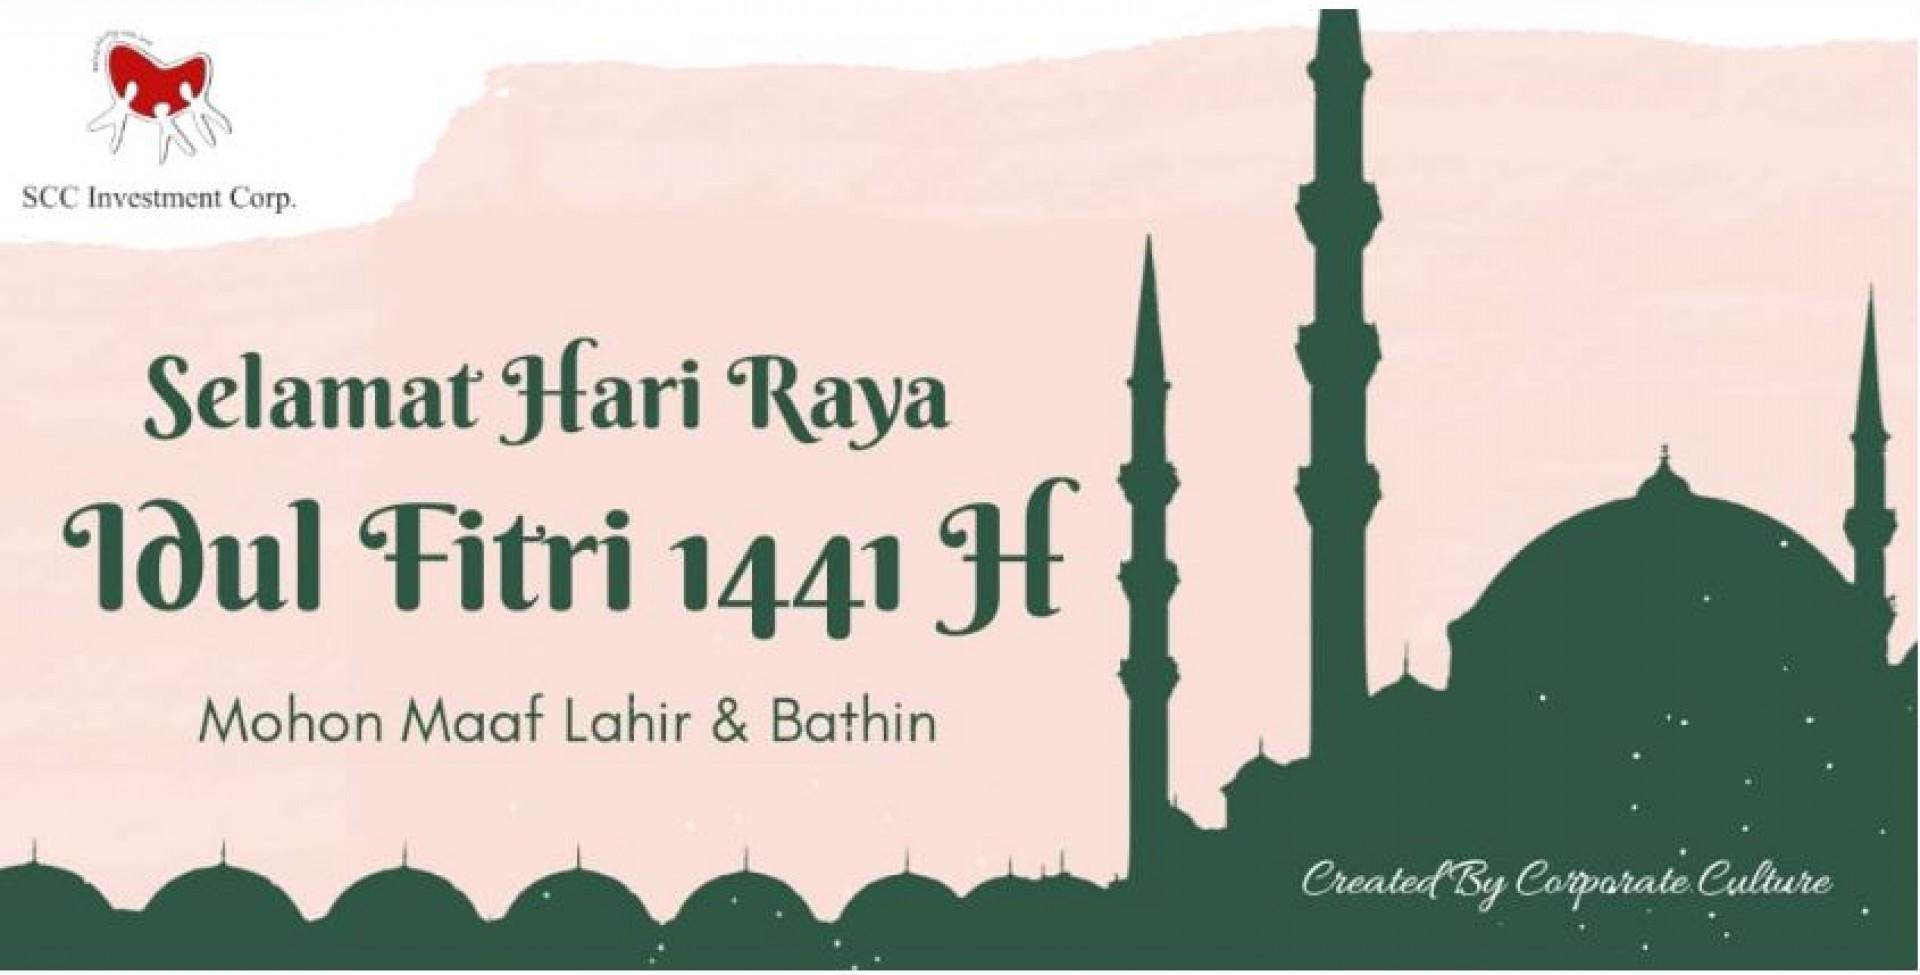 SCC Investment Corp. Mengucapkan Selamat Hari Raya Idul Fitri 2020/1441 H